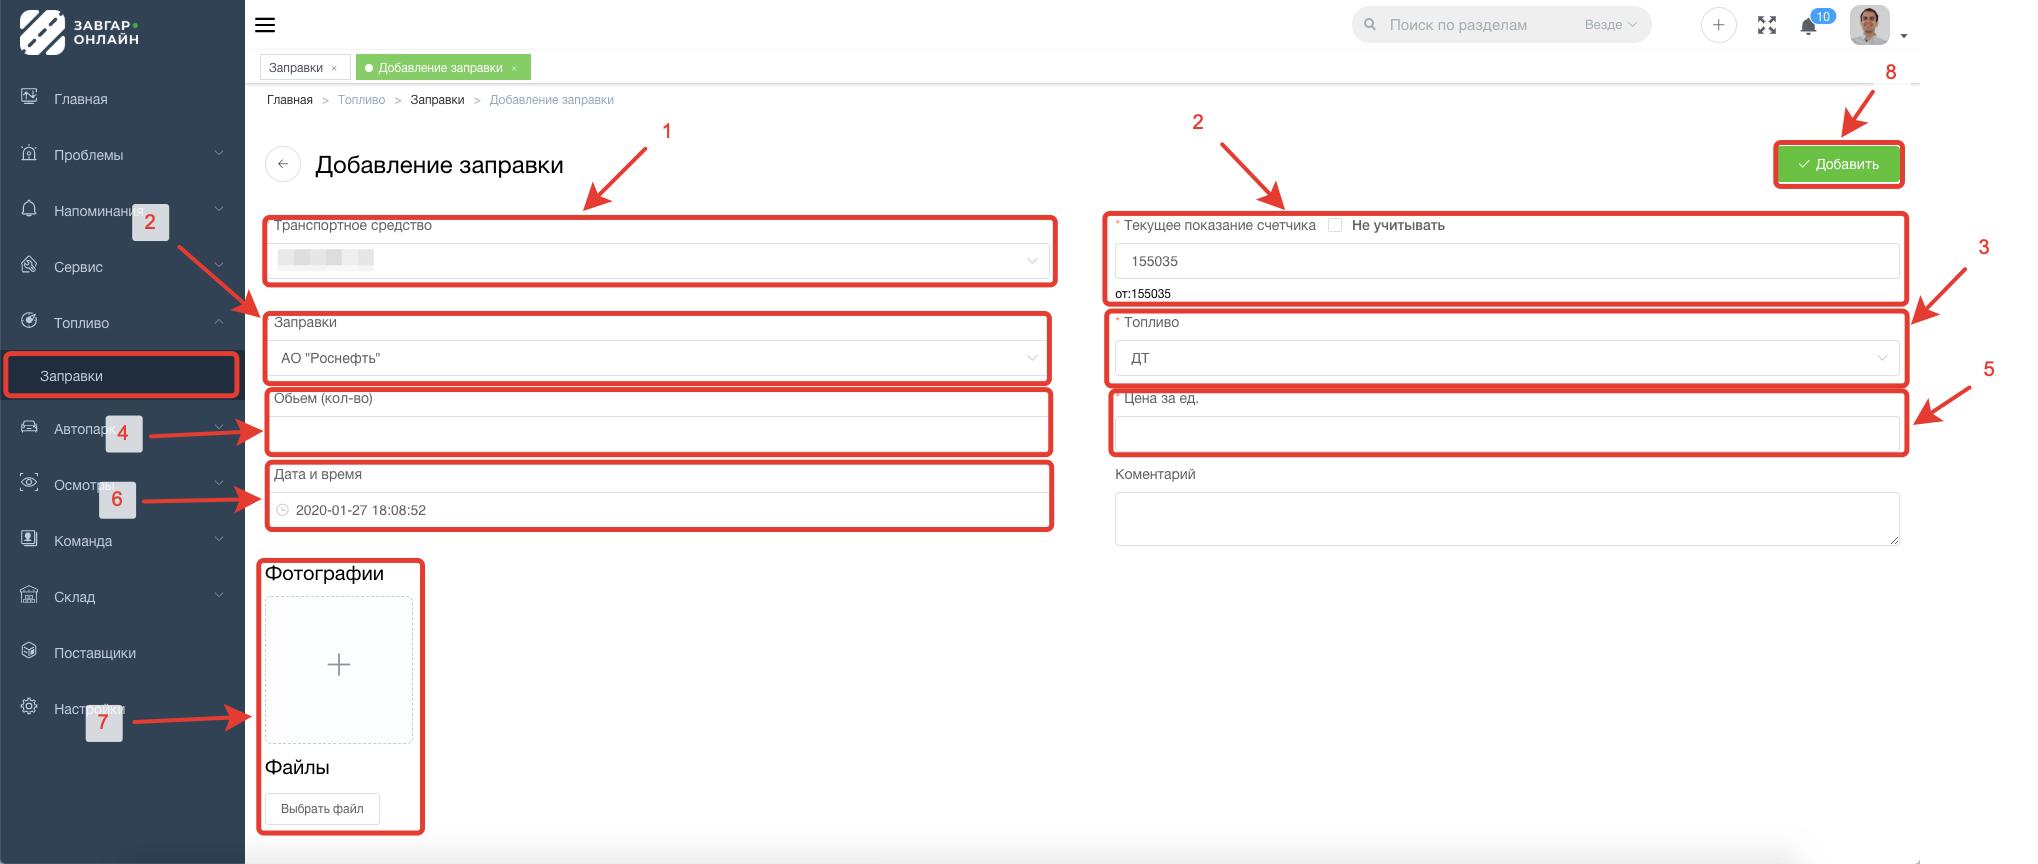 Добавление заправки через веб-интерфейс системы Завгар Онлайн